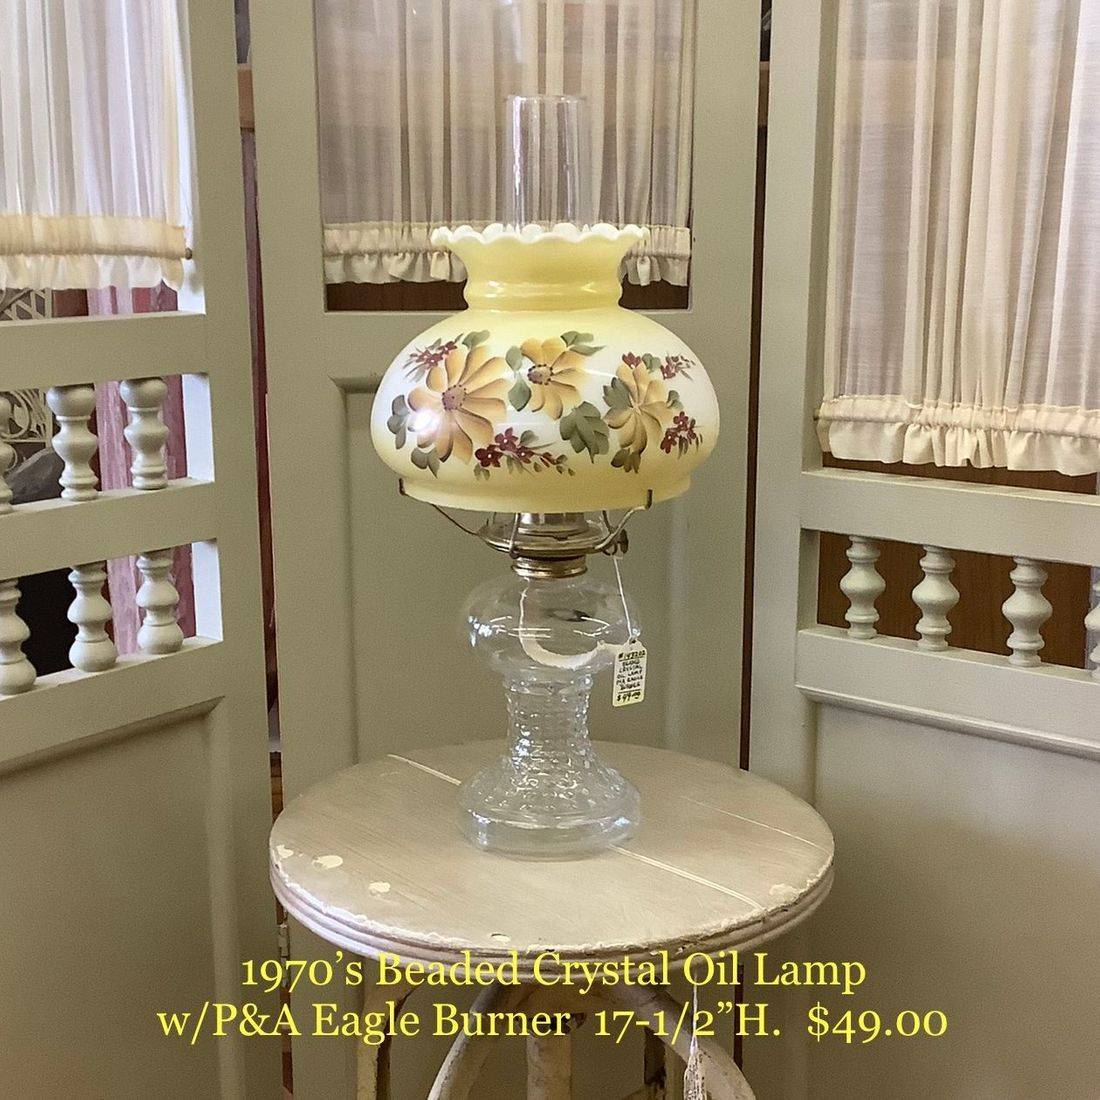 "1970's Beaded Crystal Oil Lamp  17-1/2""H.  $49.00"